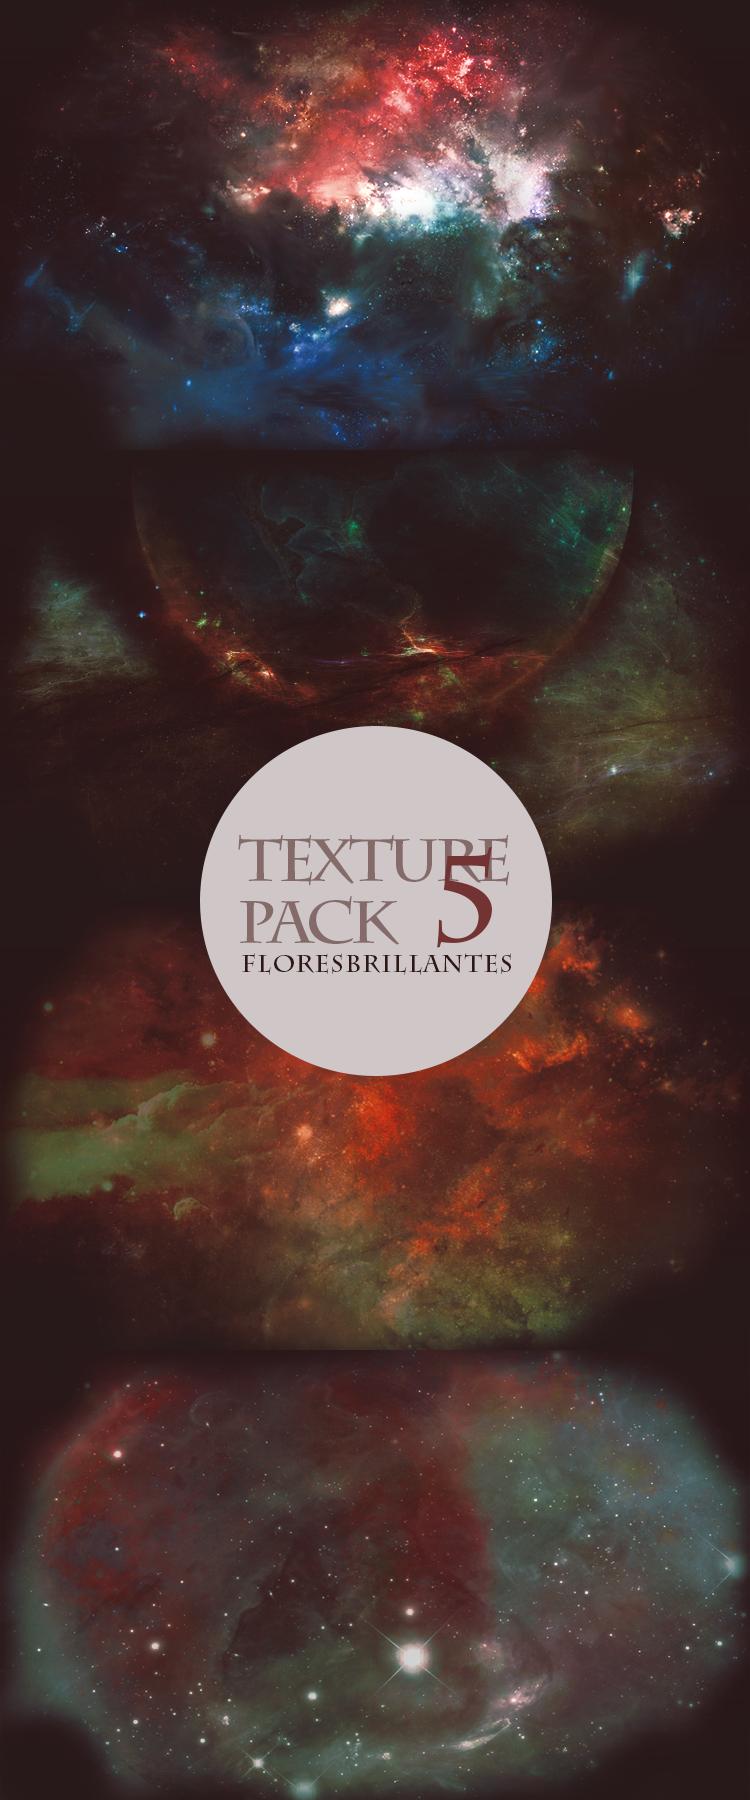 texture pack - 5 by floresbrillantes